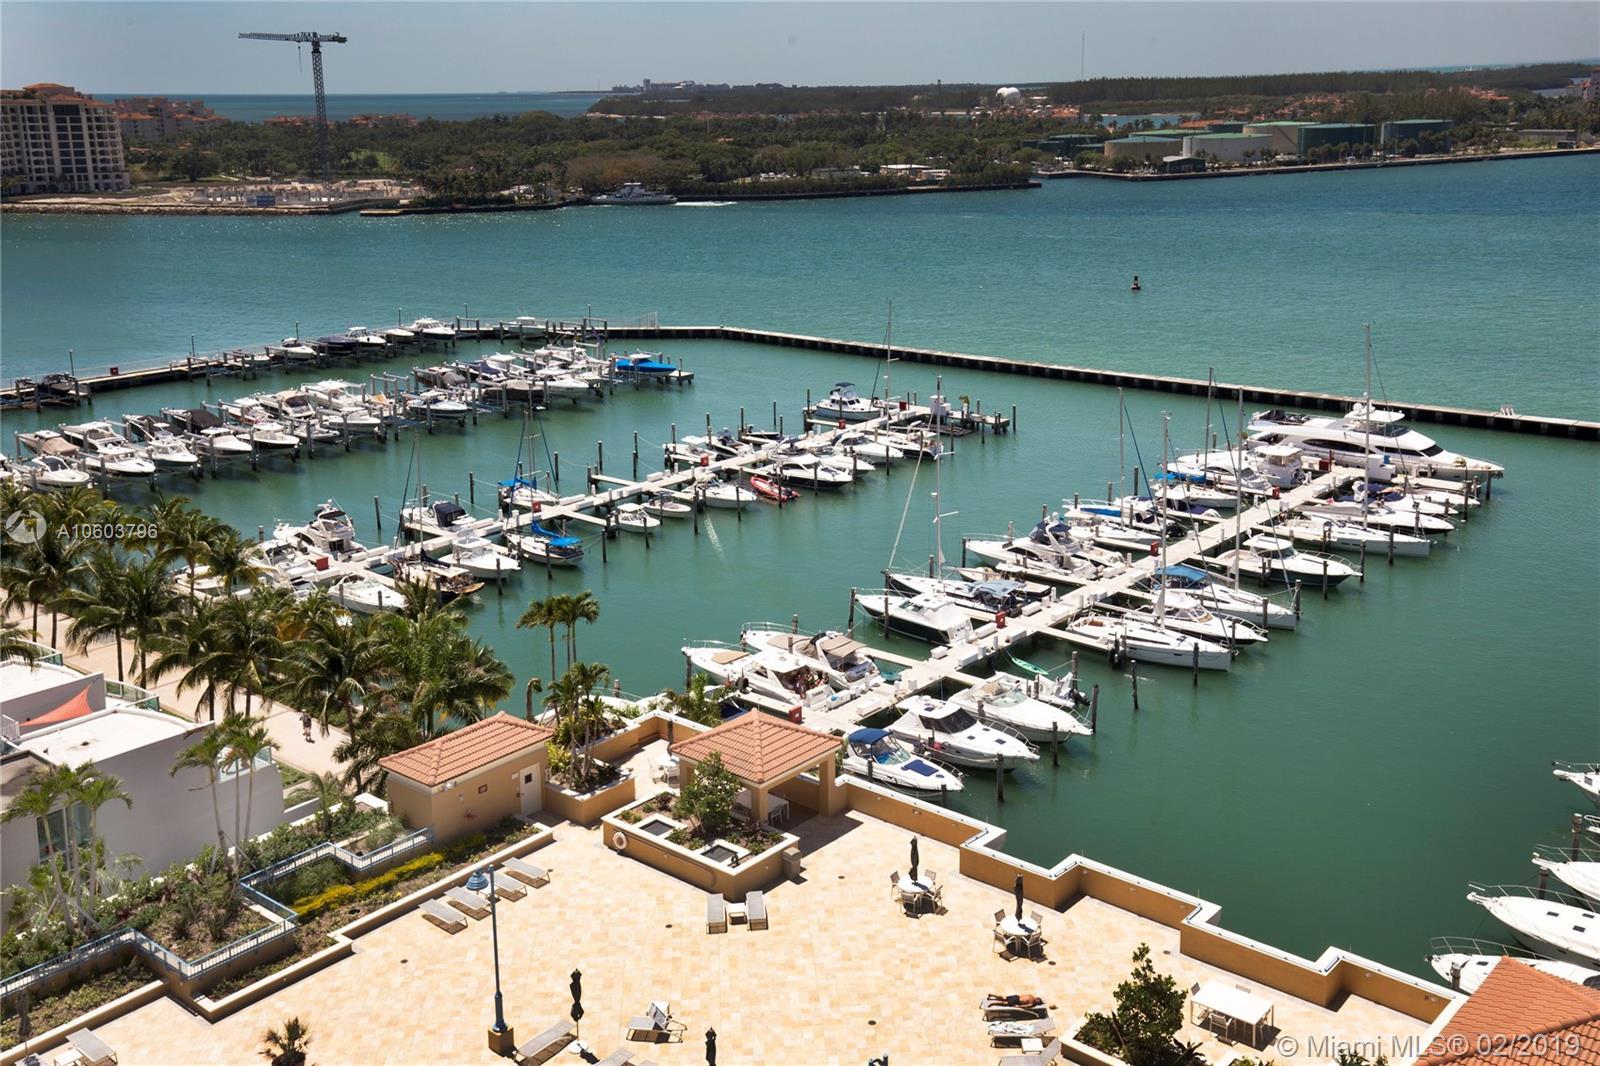 Photo of The Yacht Club Portofino Apt 1708